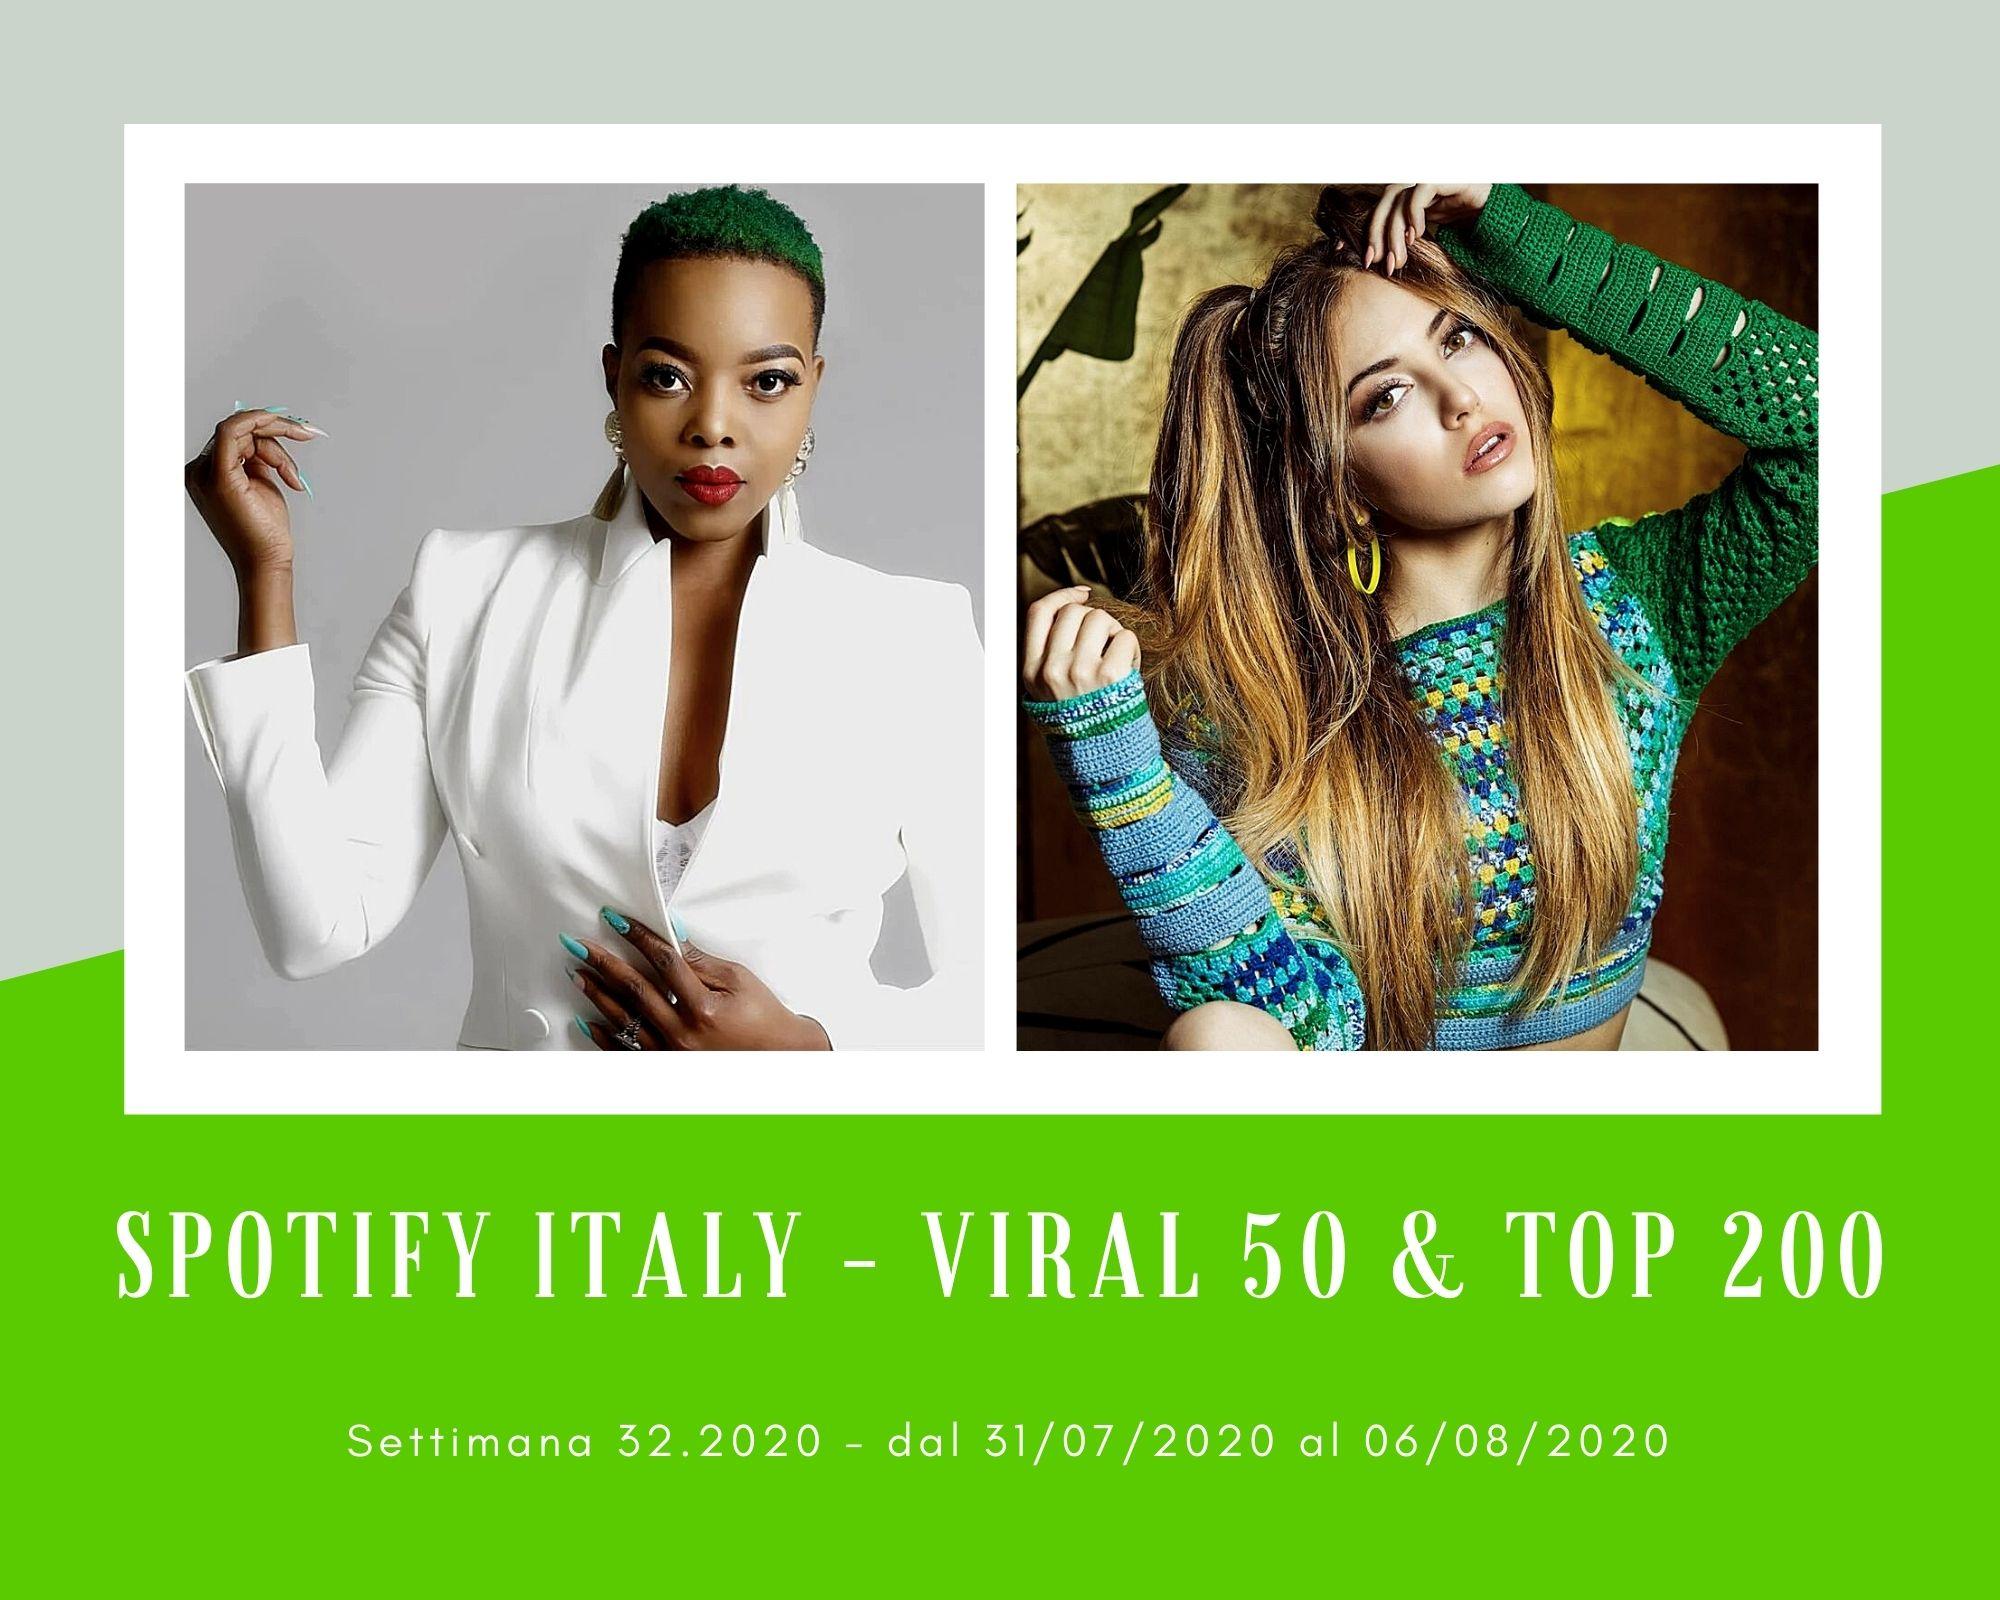 Classifica Spotify, week 32: dominano le accoppiate Master KG & Nomcebo Zikode e Rocco Hunt & Ana Mena